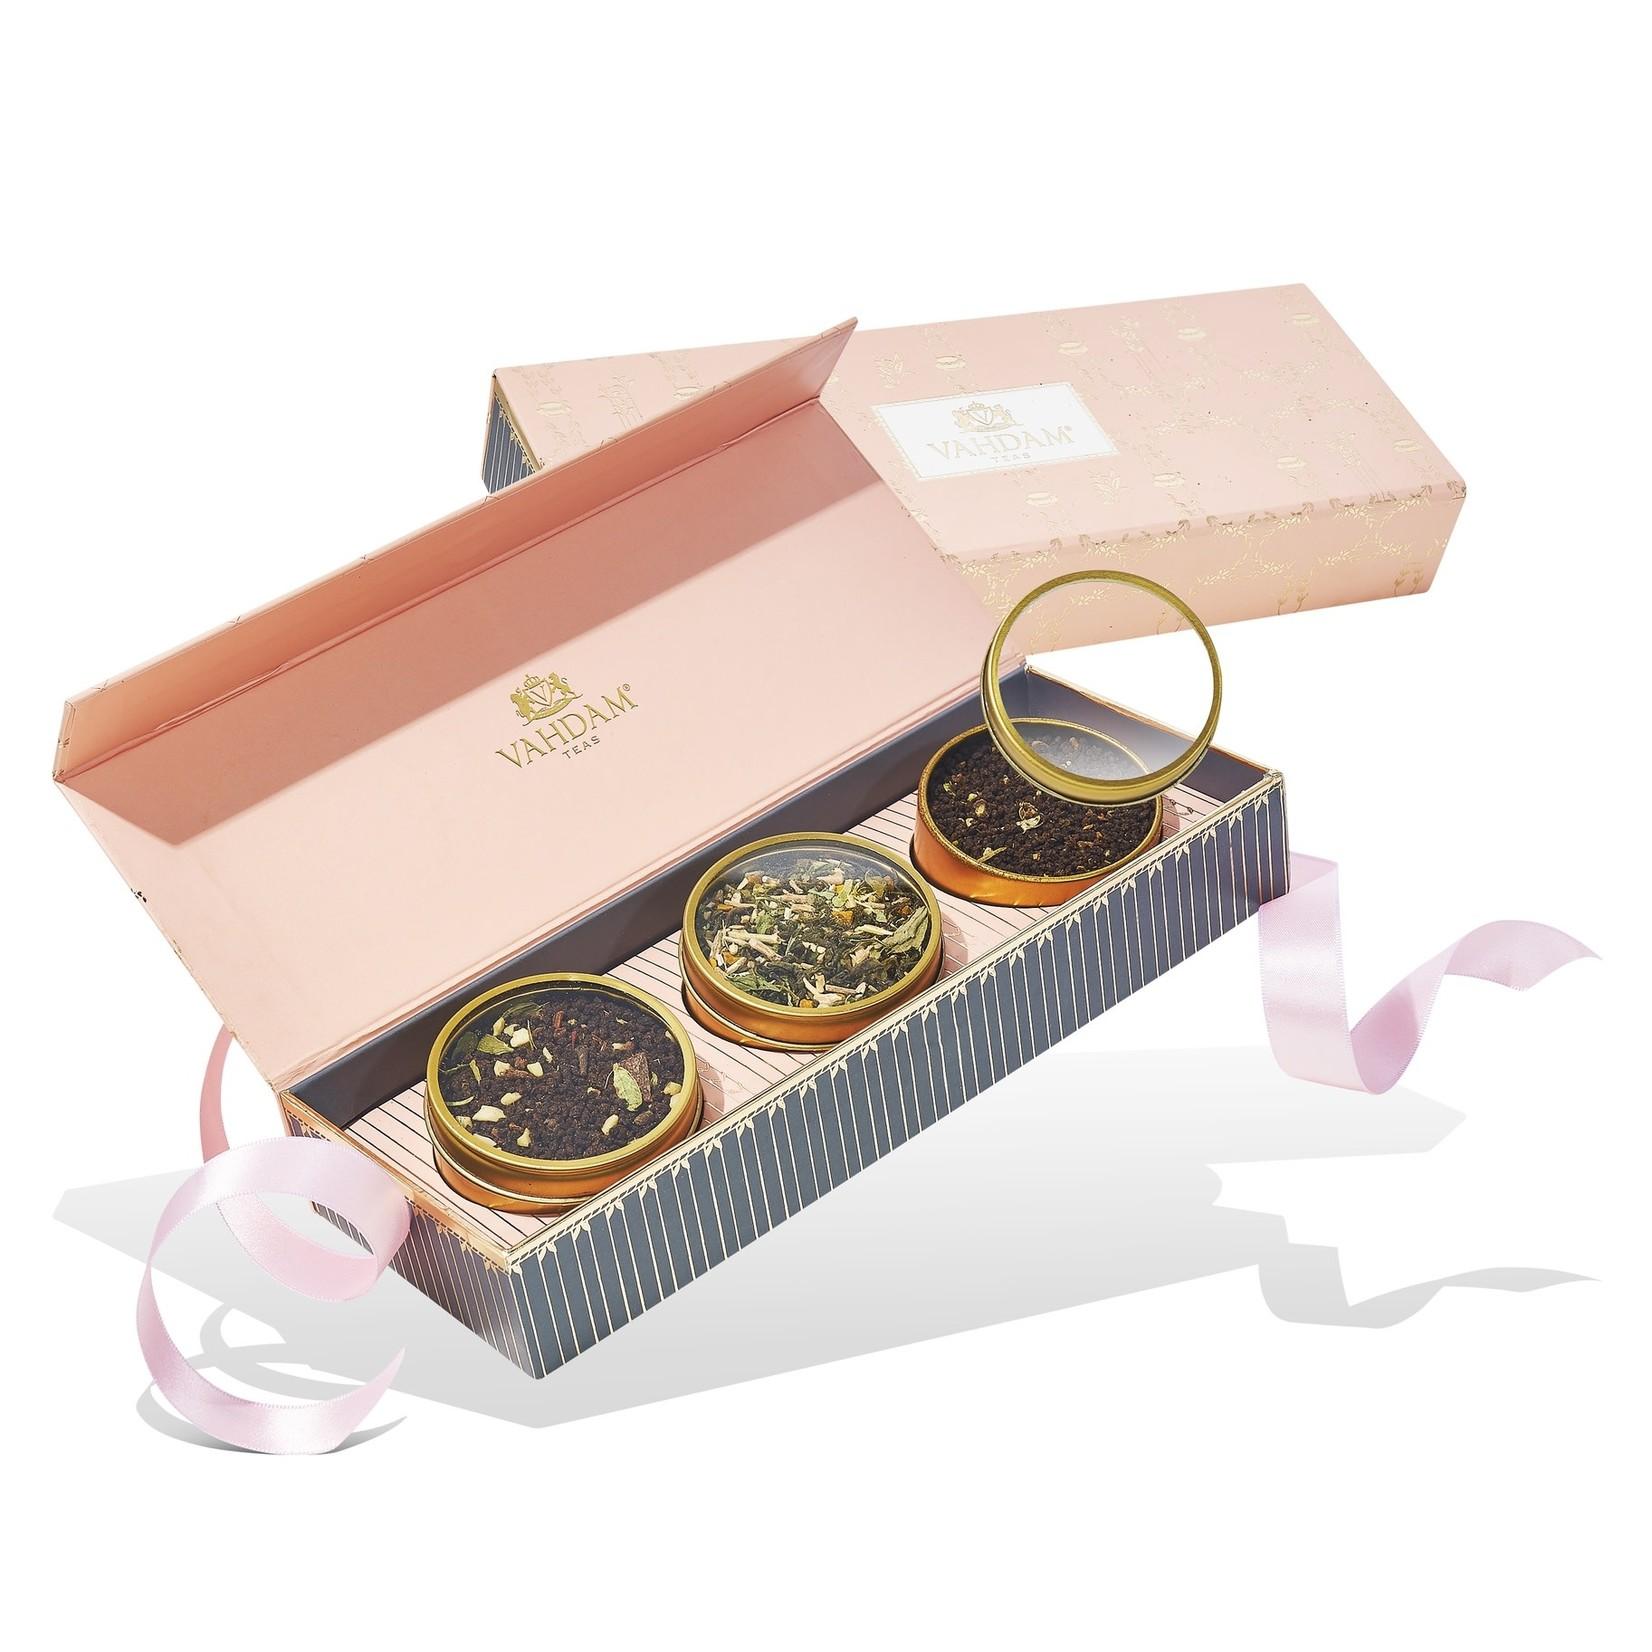 Blush Tea Gift Box